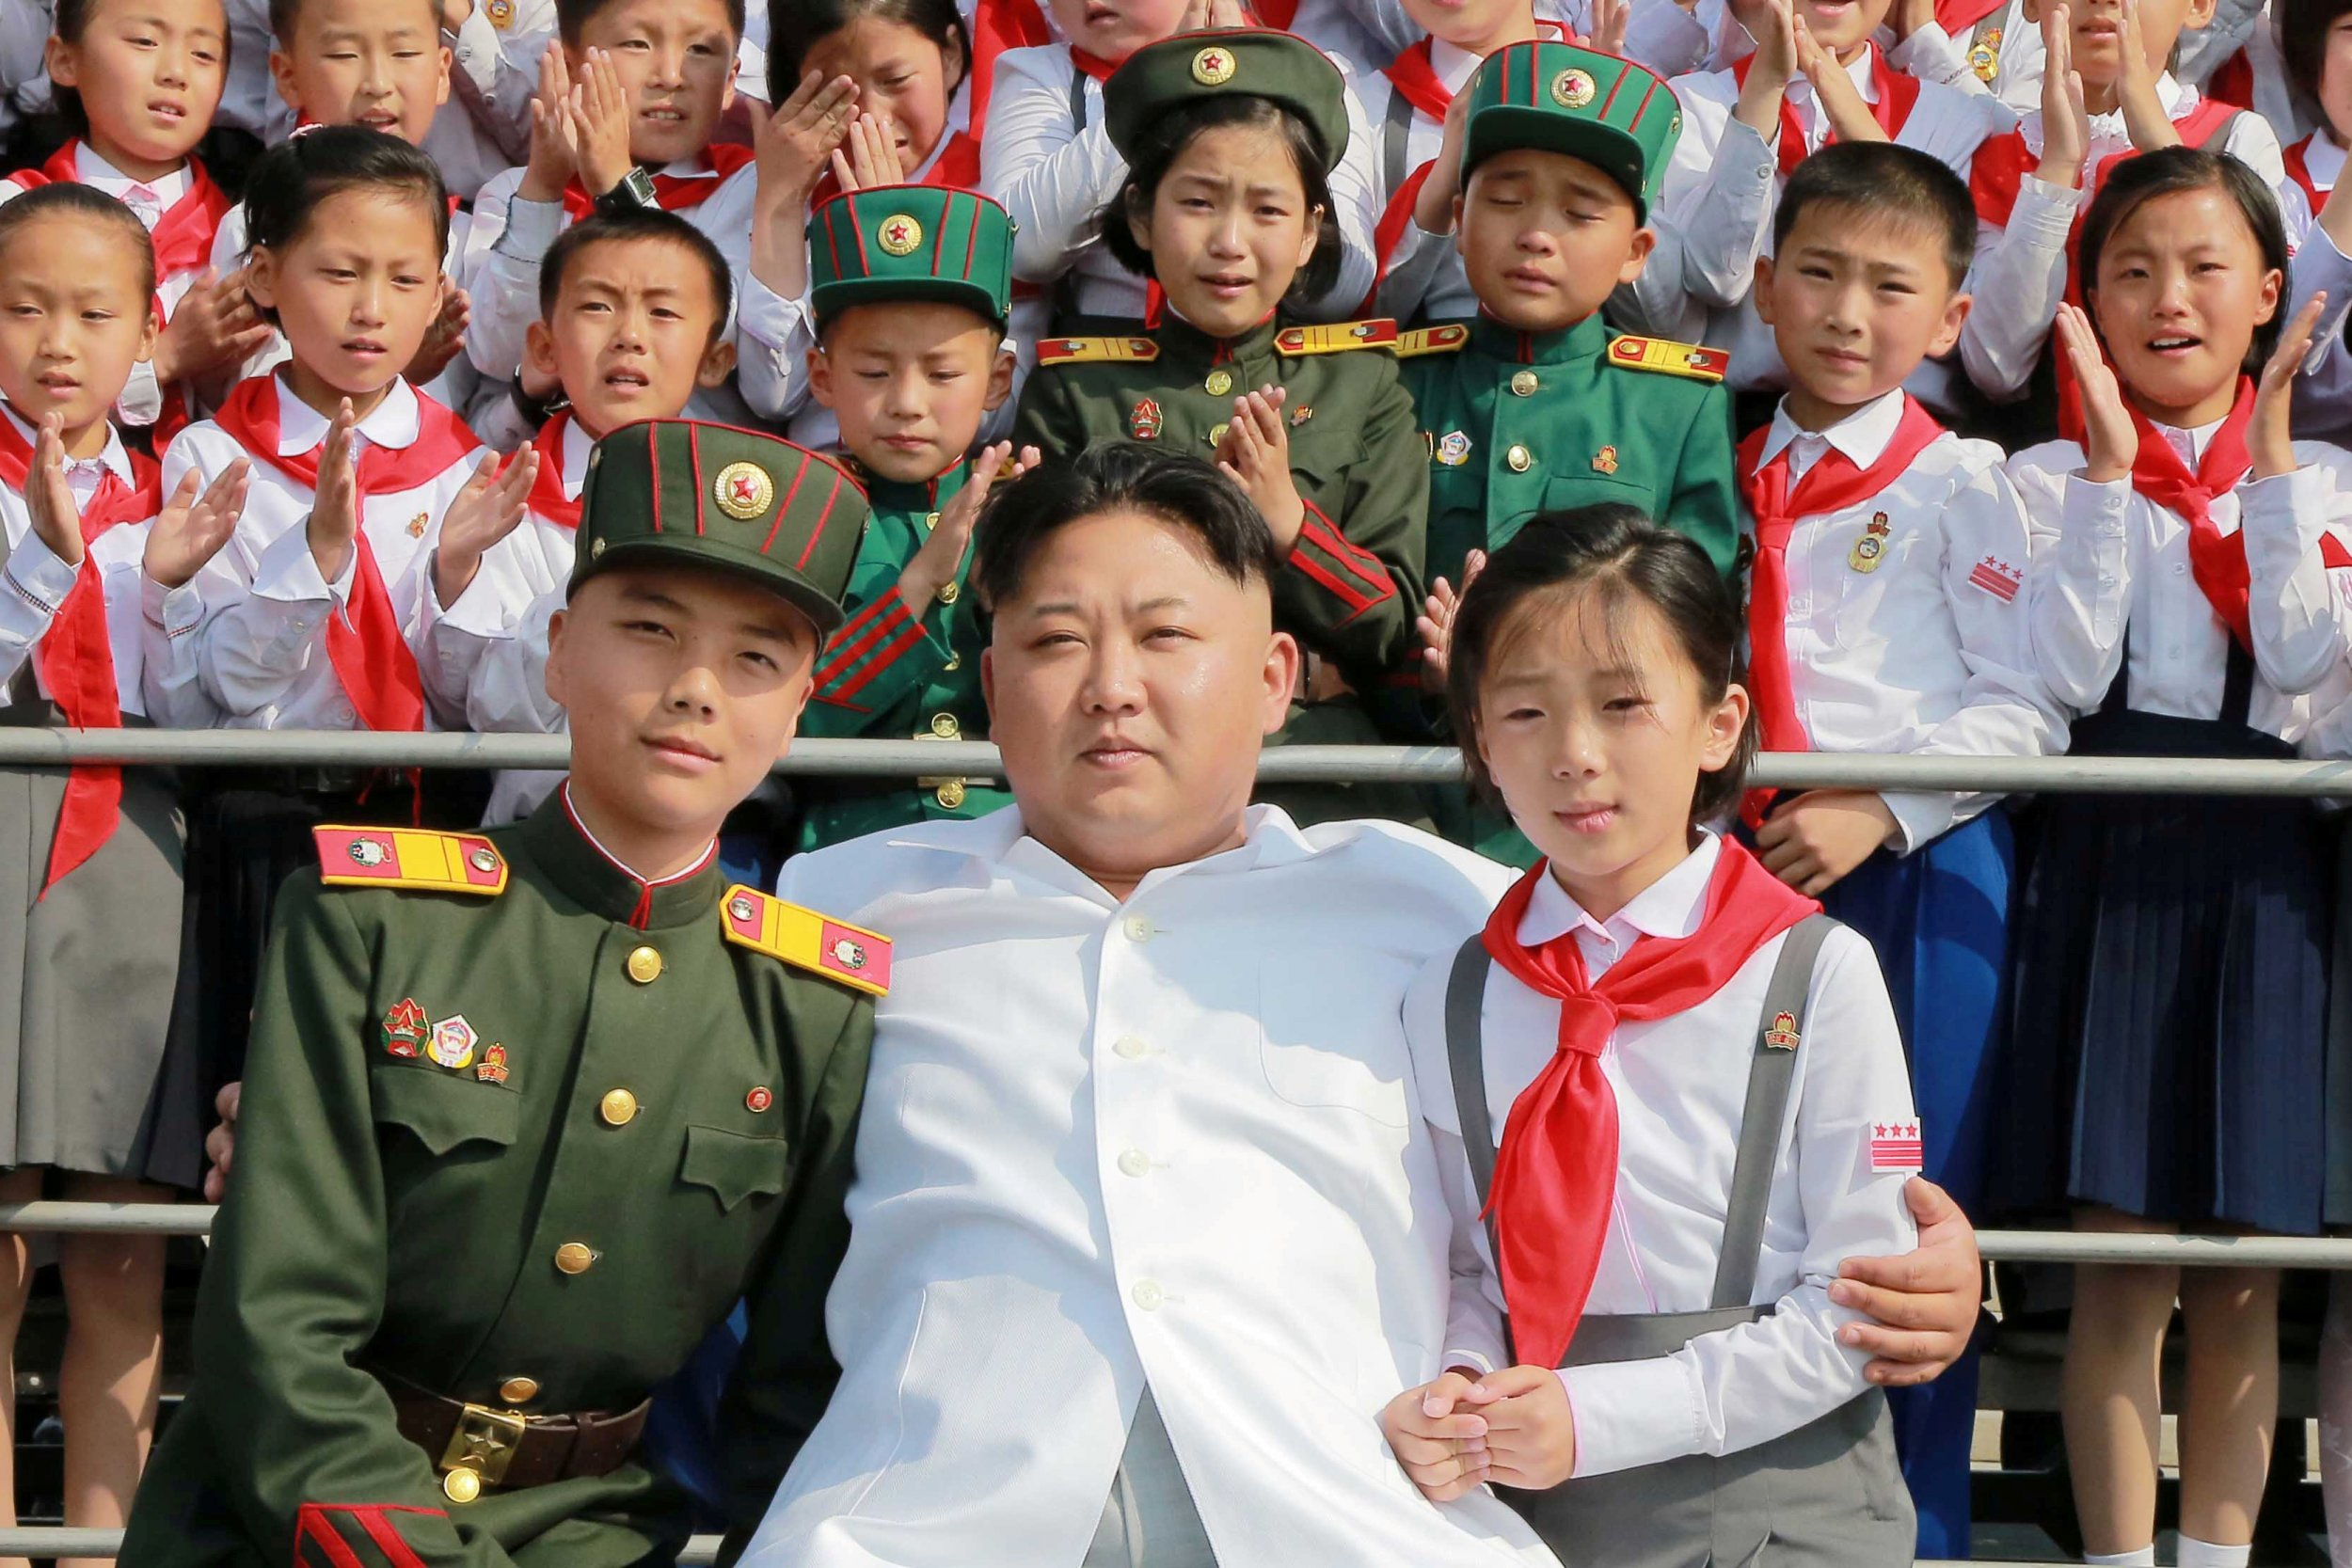 Kim Jong Un with children